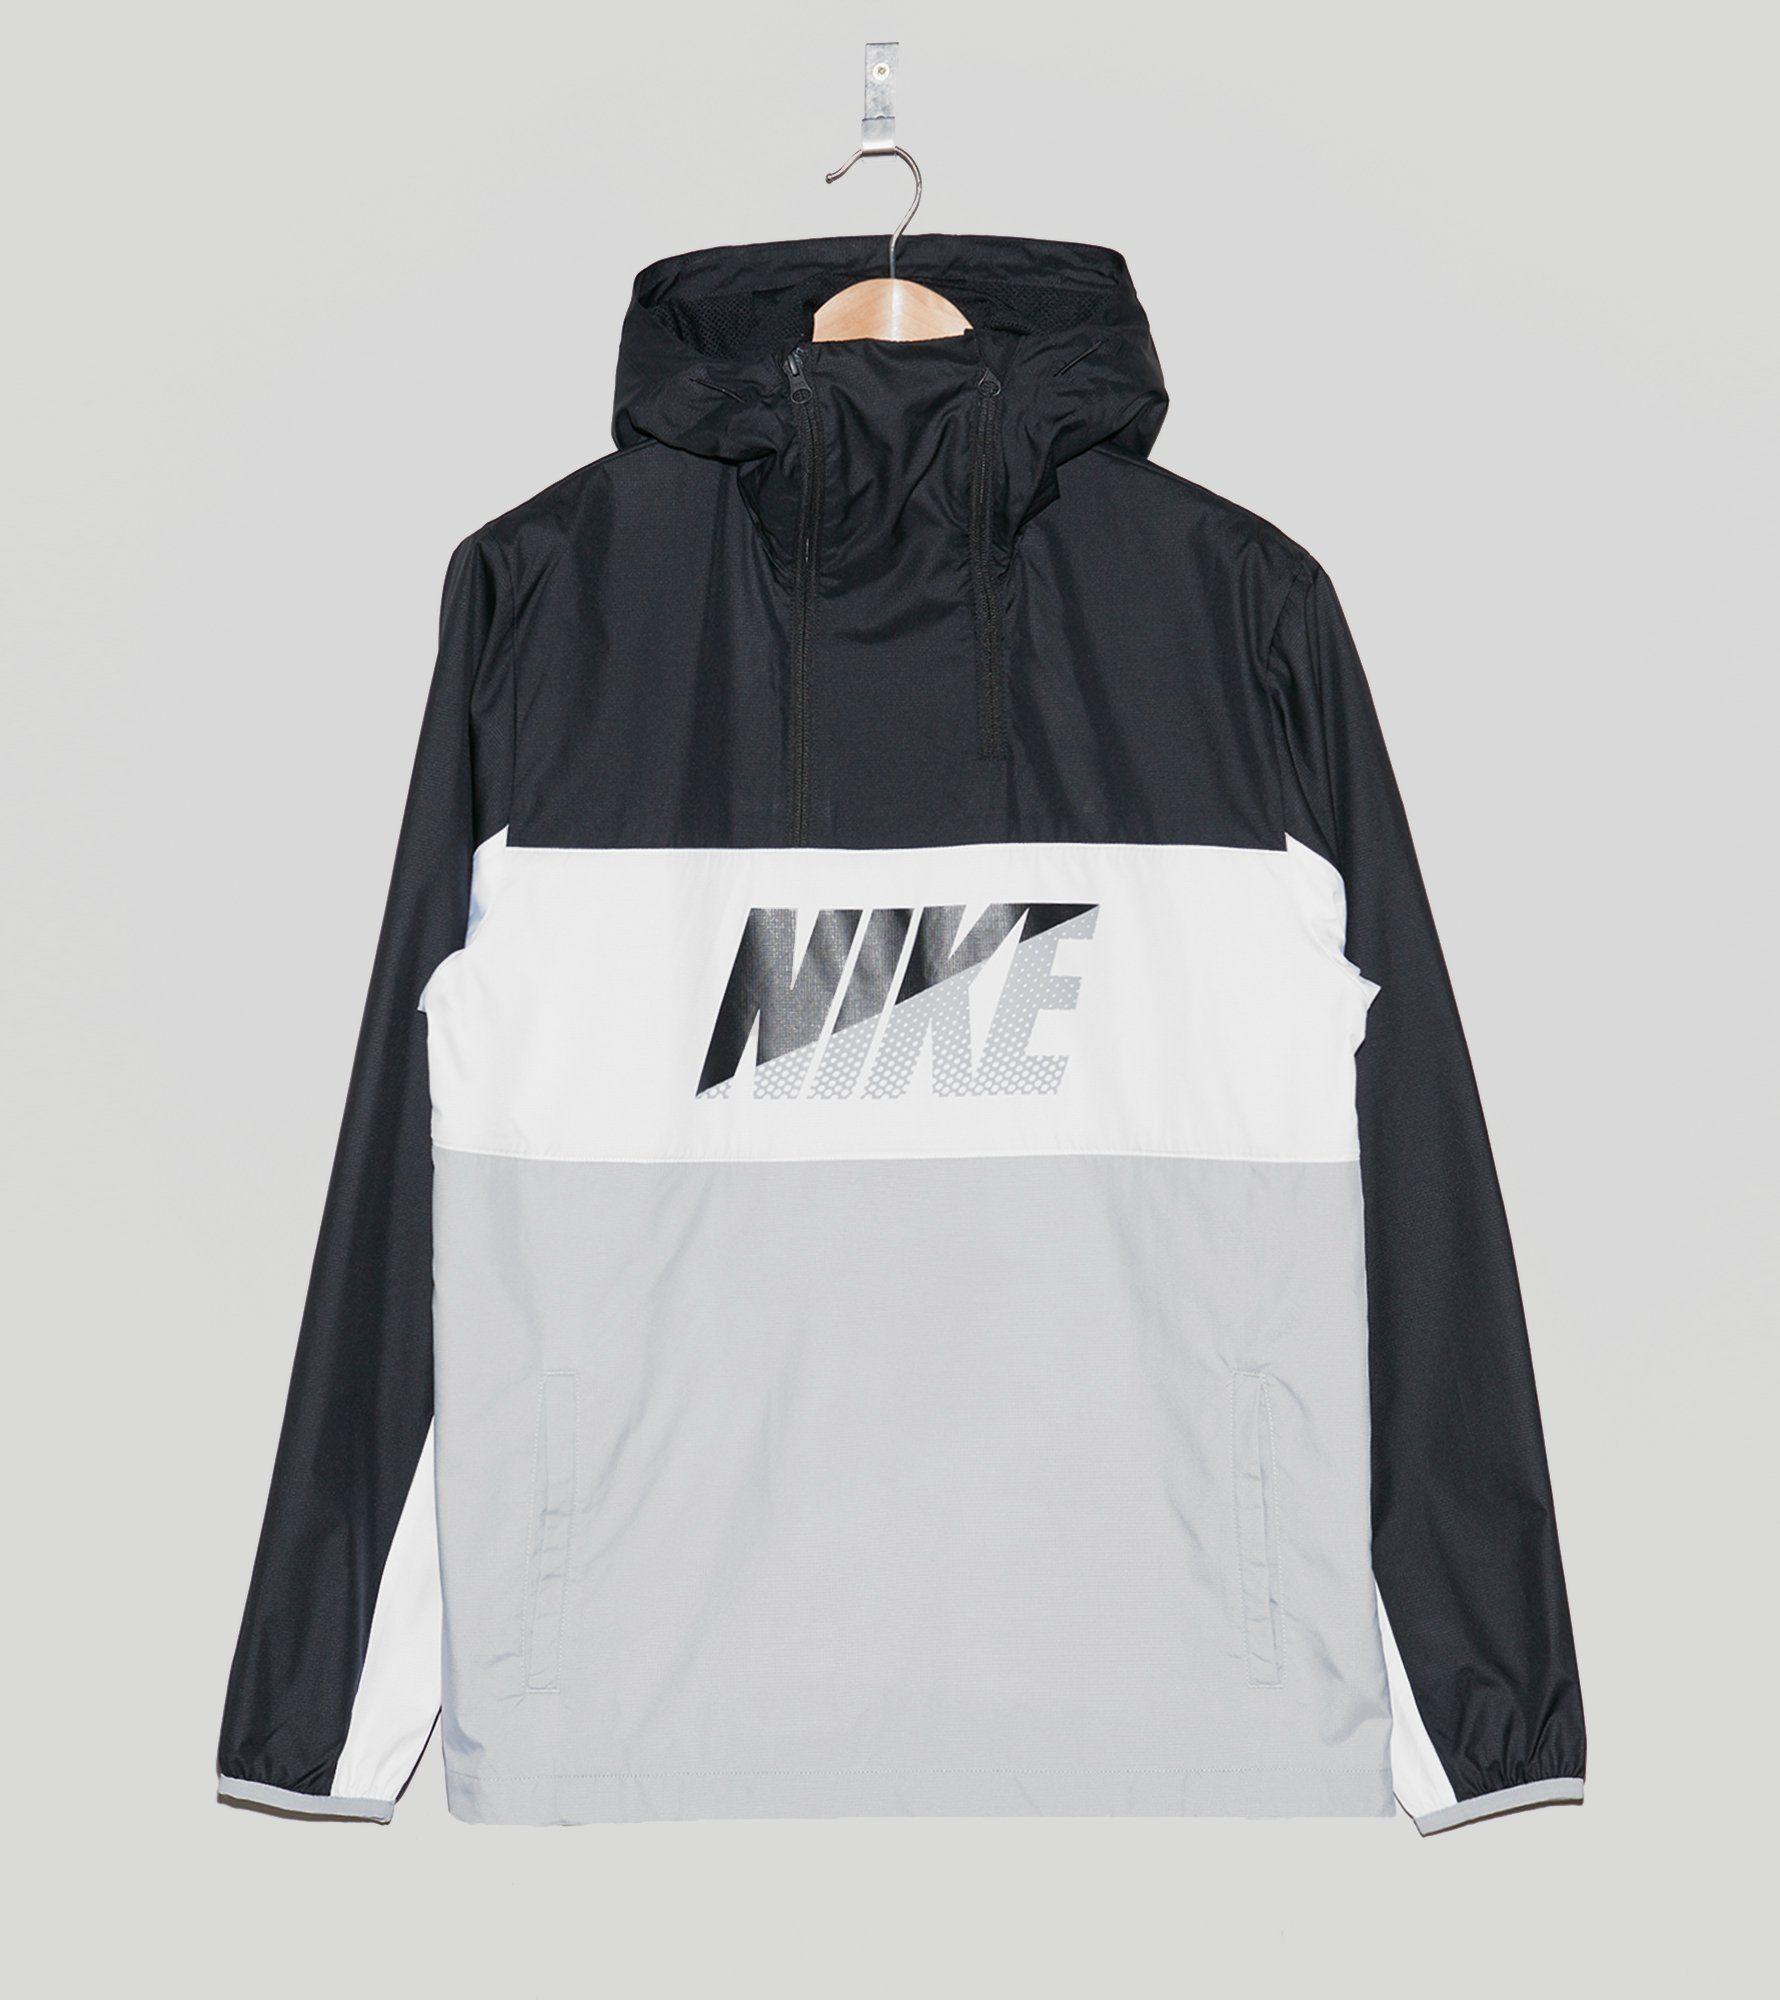 Nike jacket gray and black - Nike Jacket Gray And Black 31